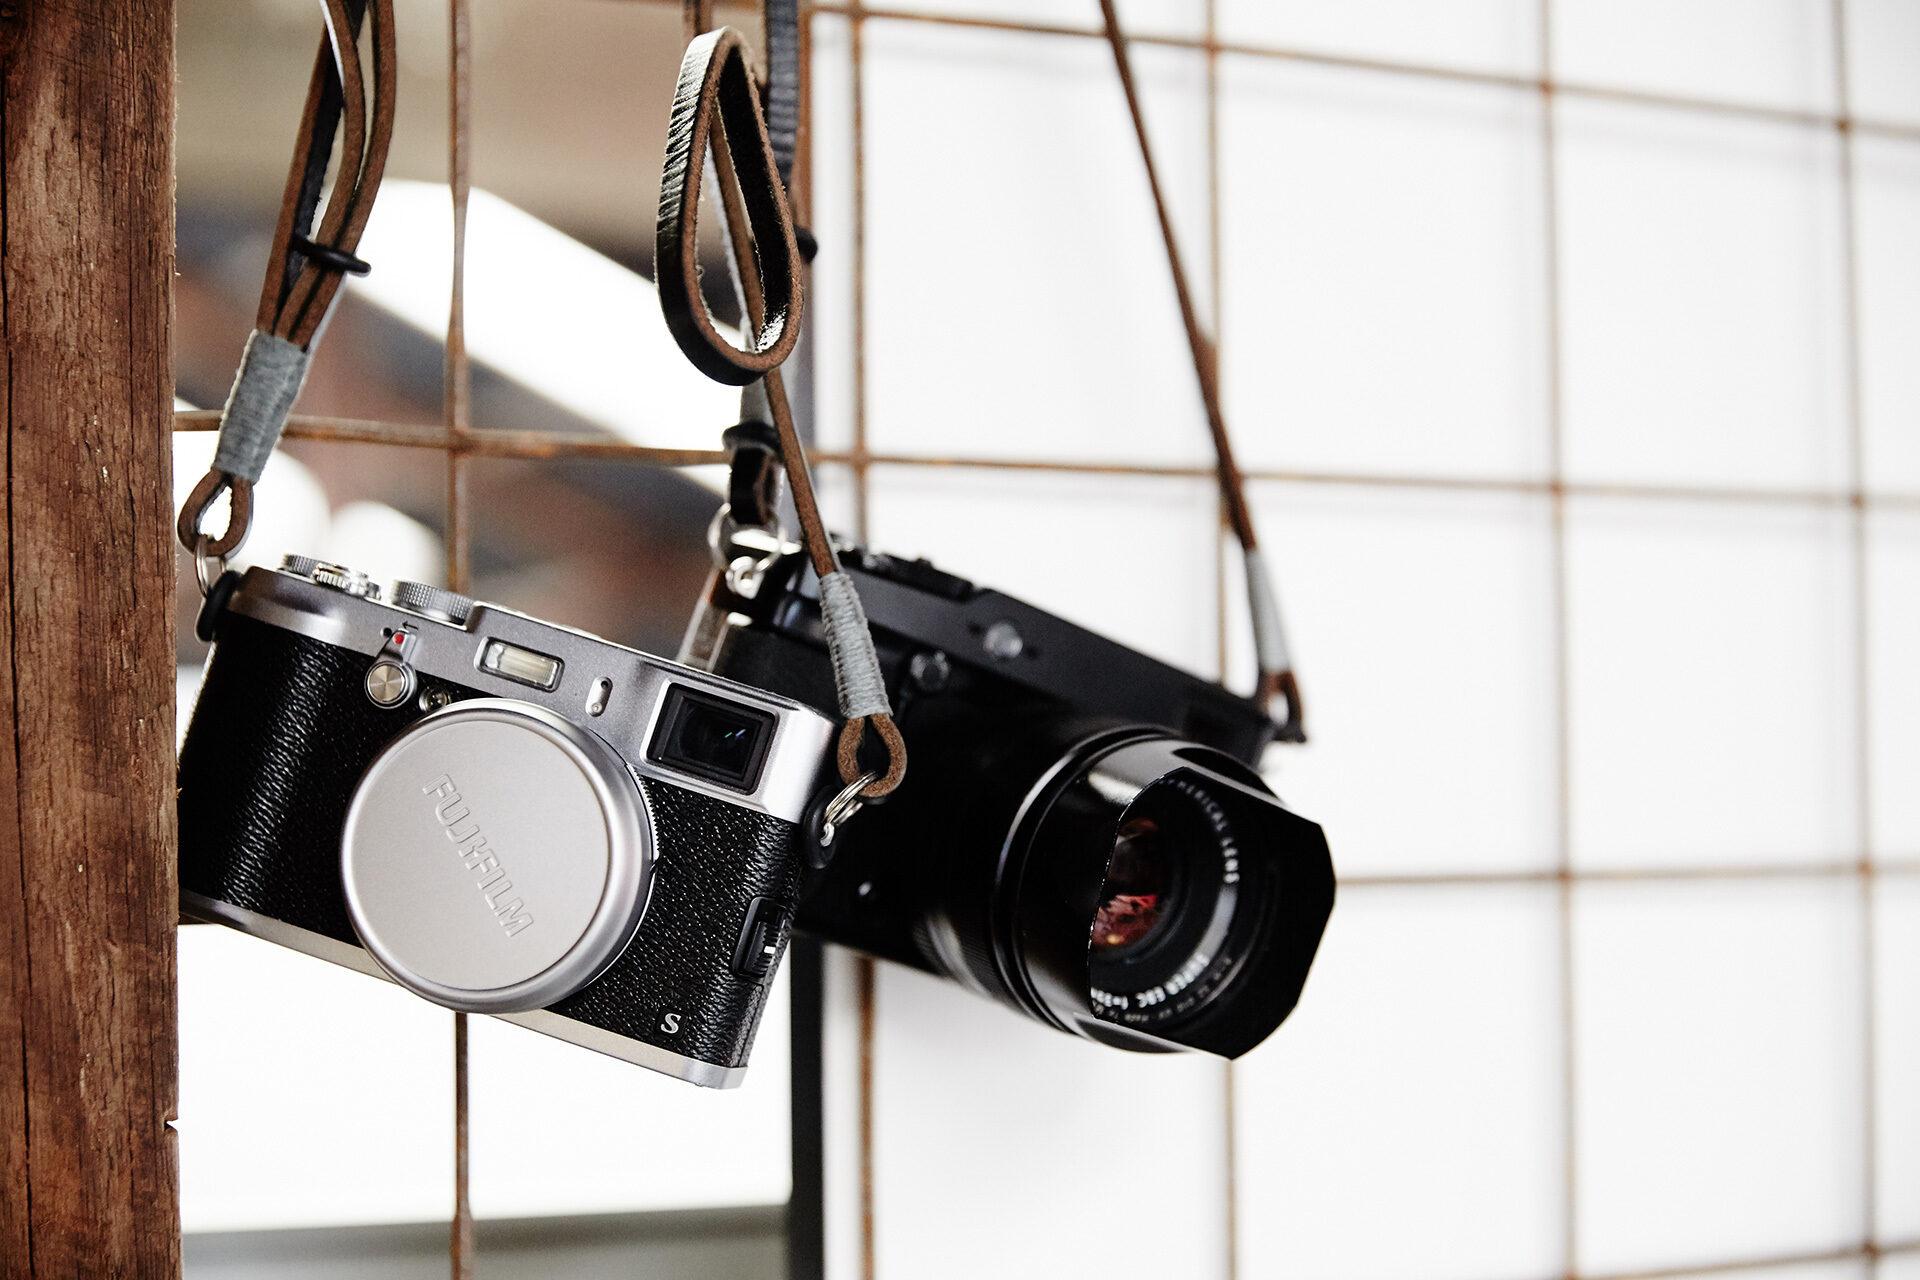 Headjam cameras